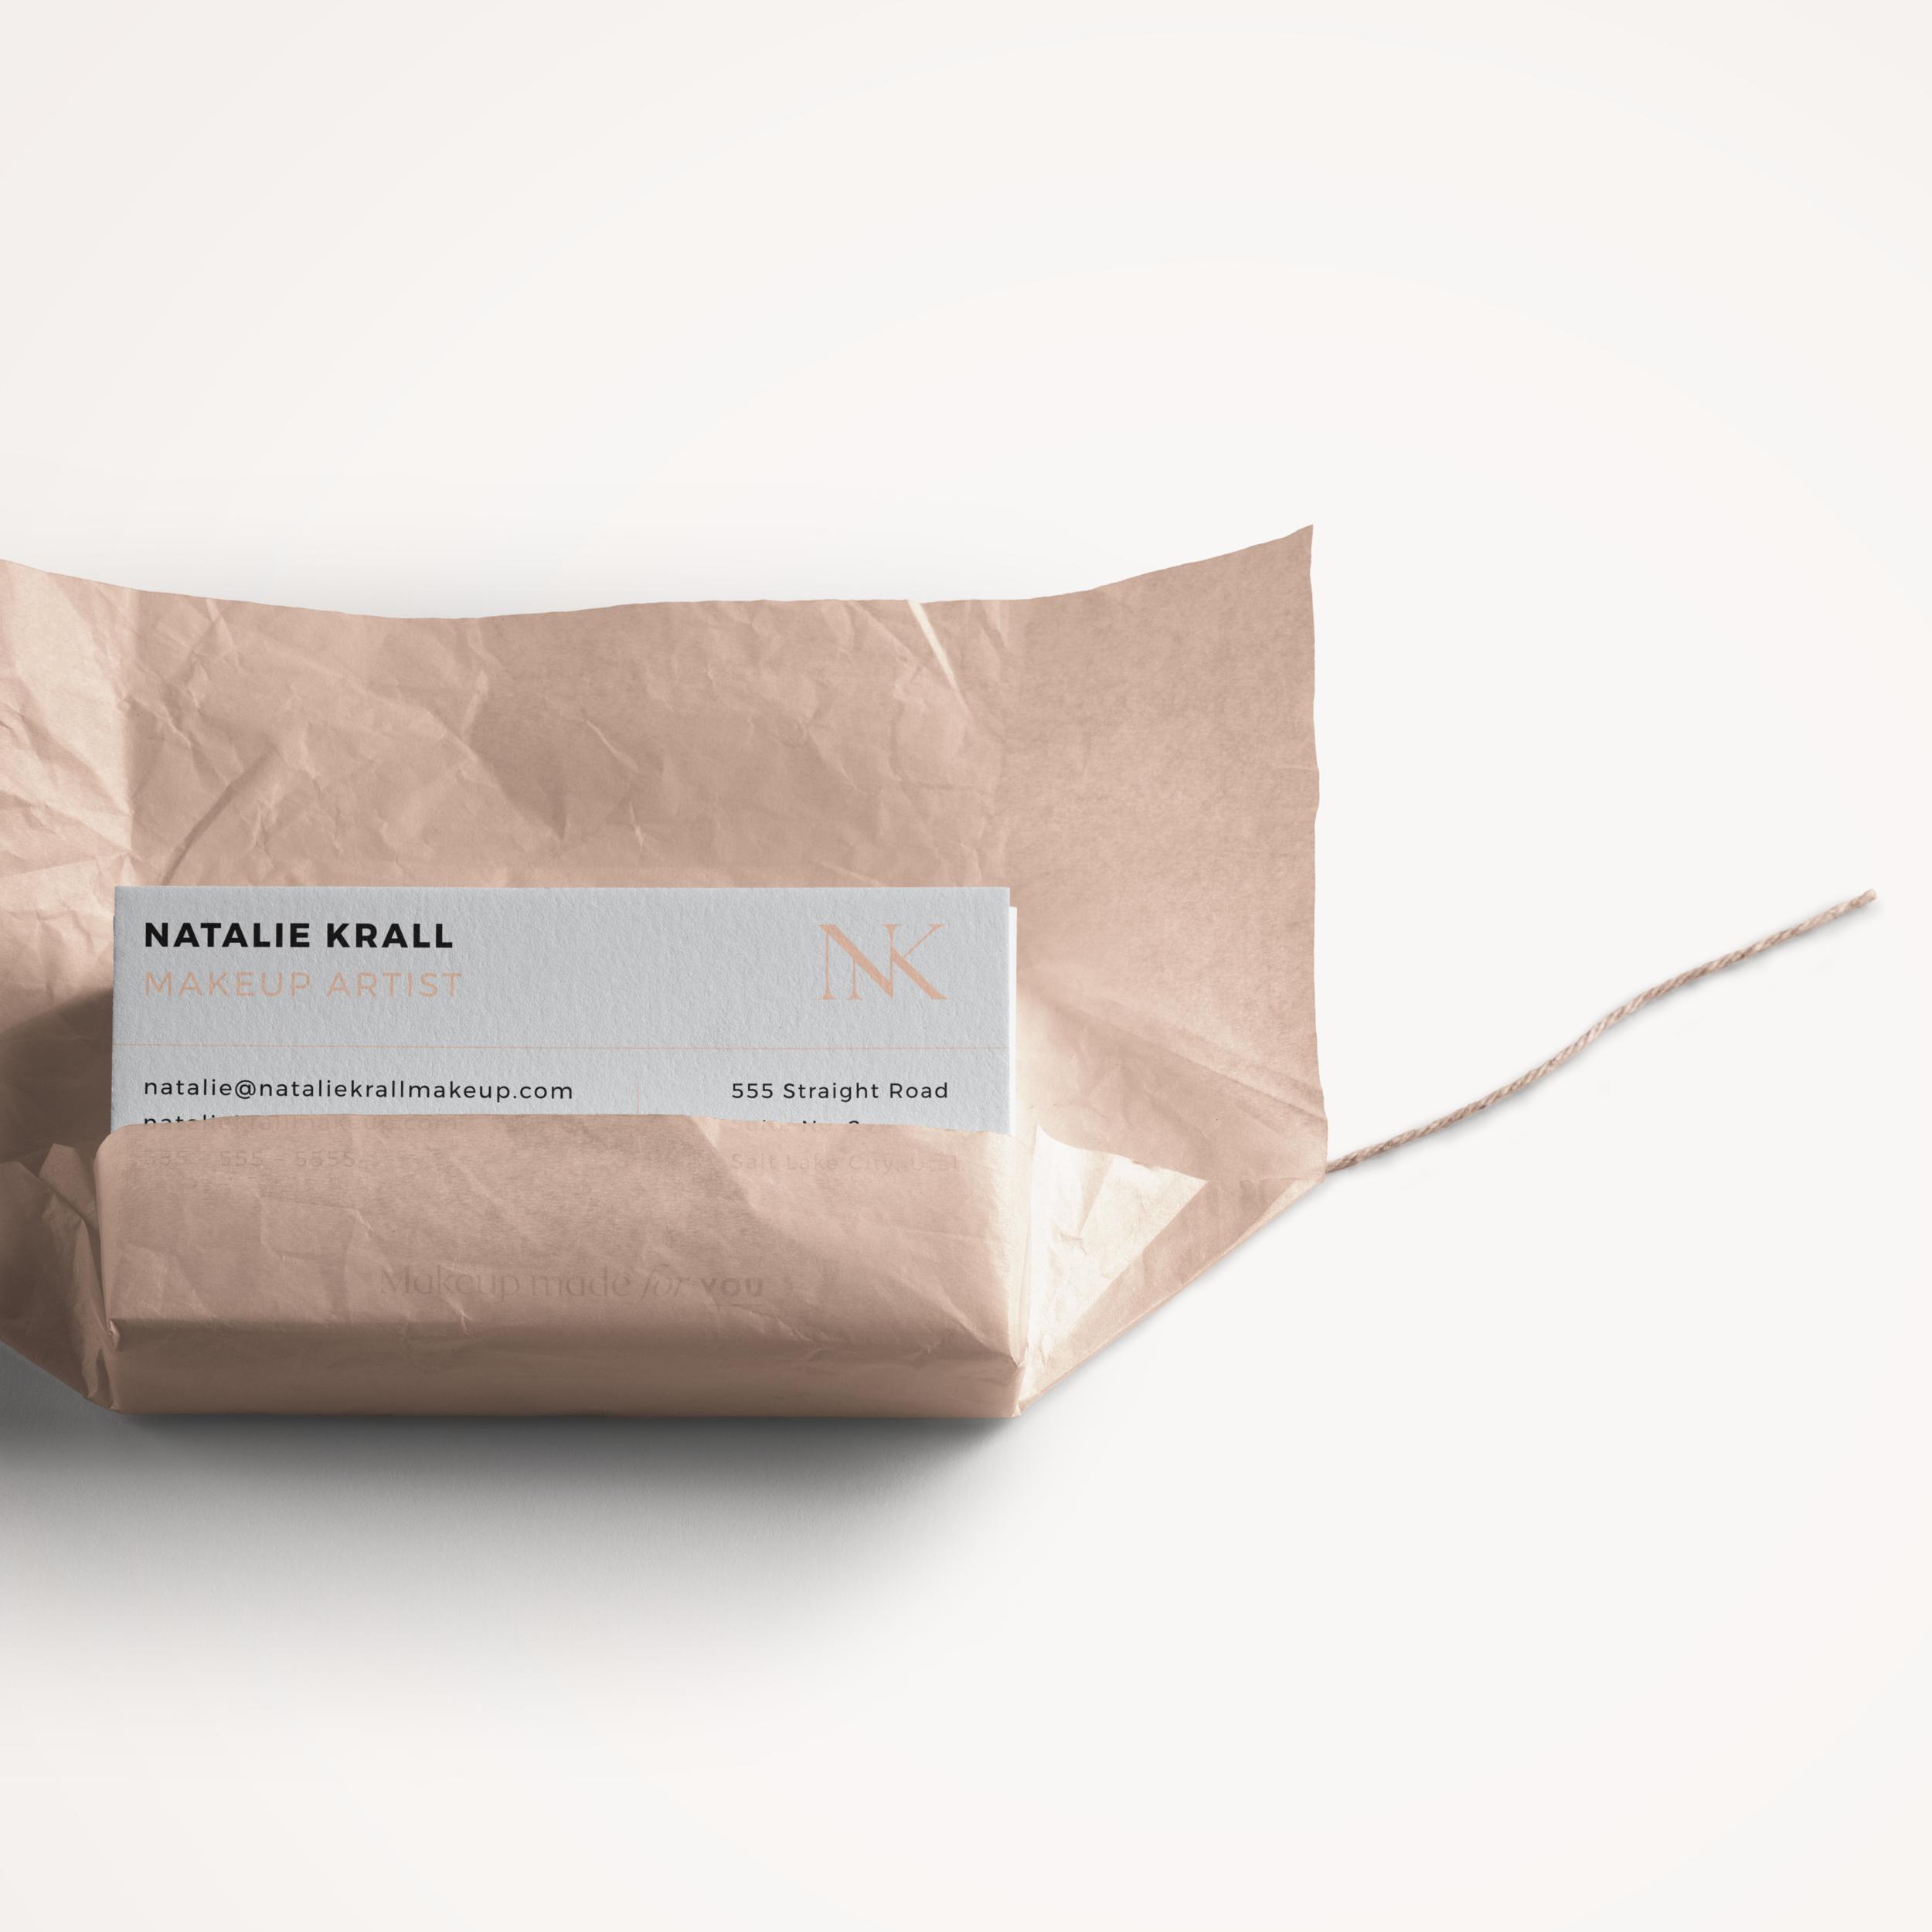 Natalie Krall Makeup Brand Design.png